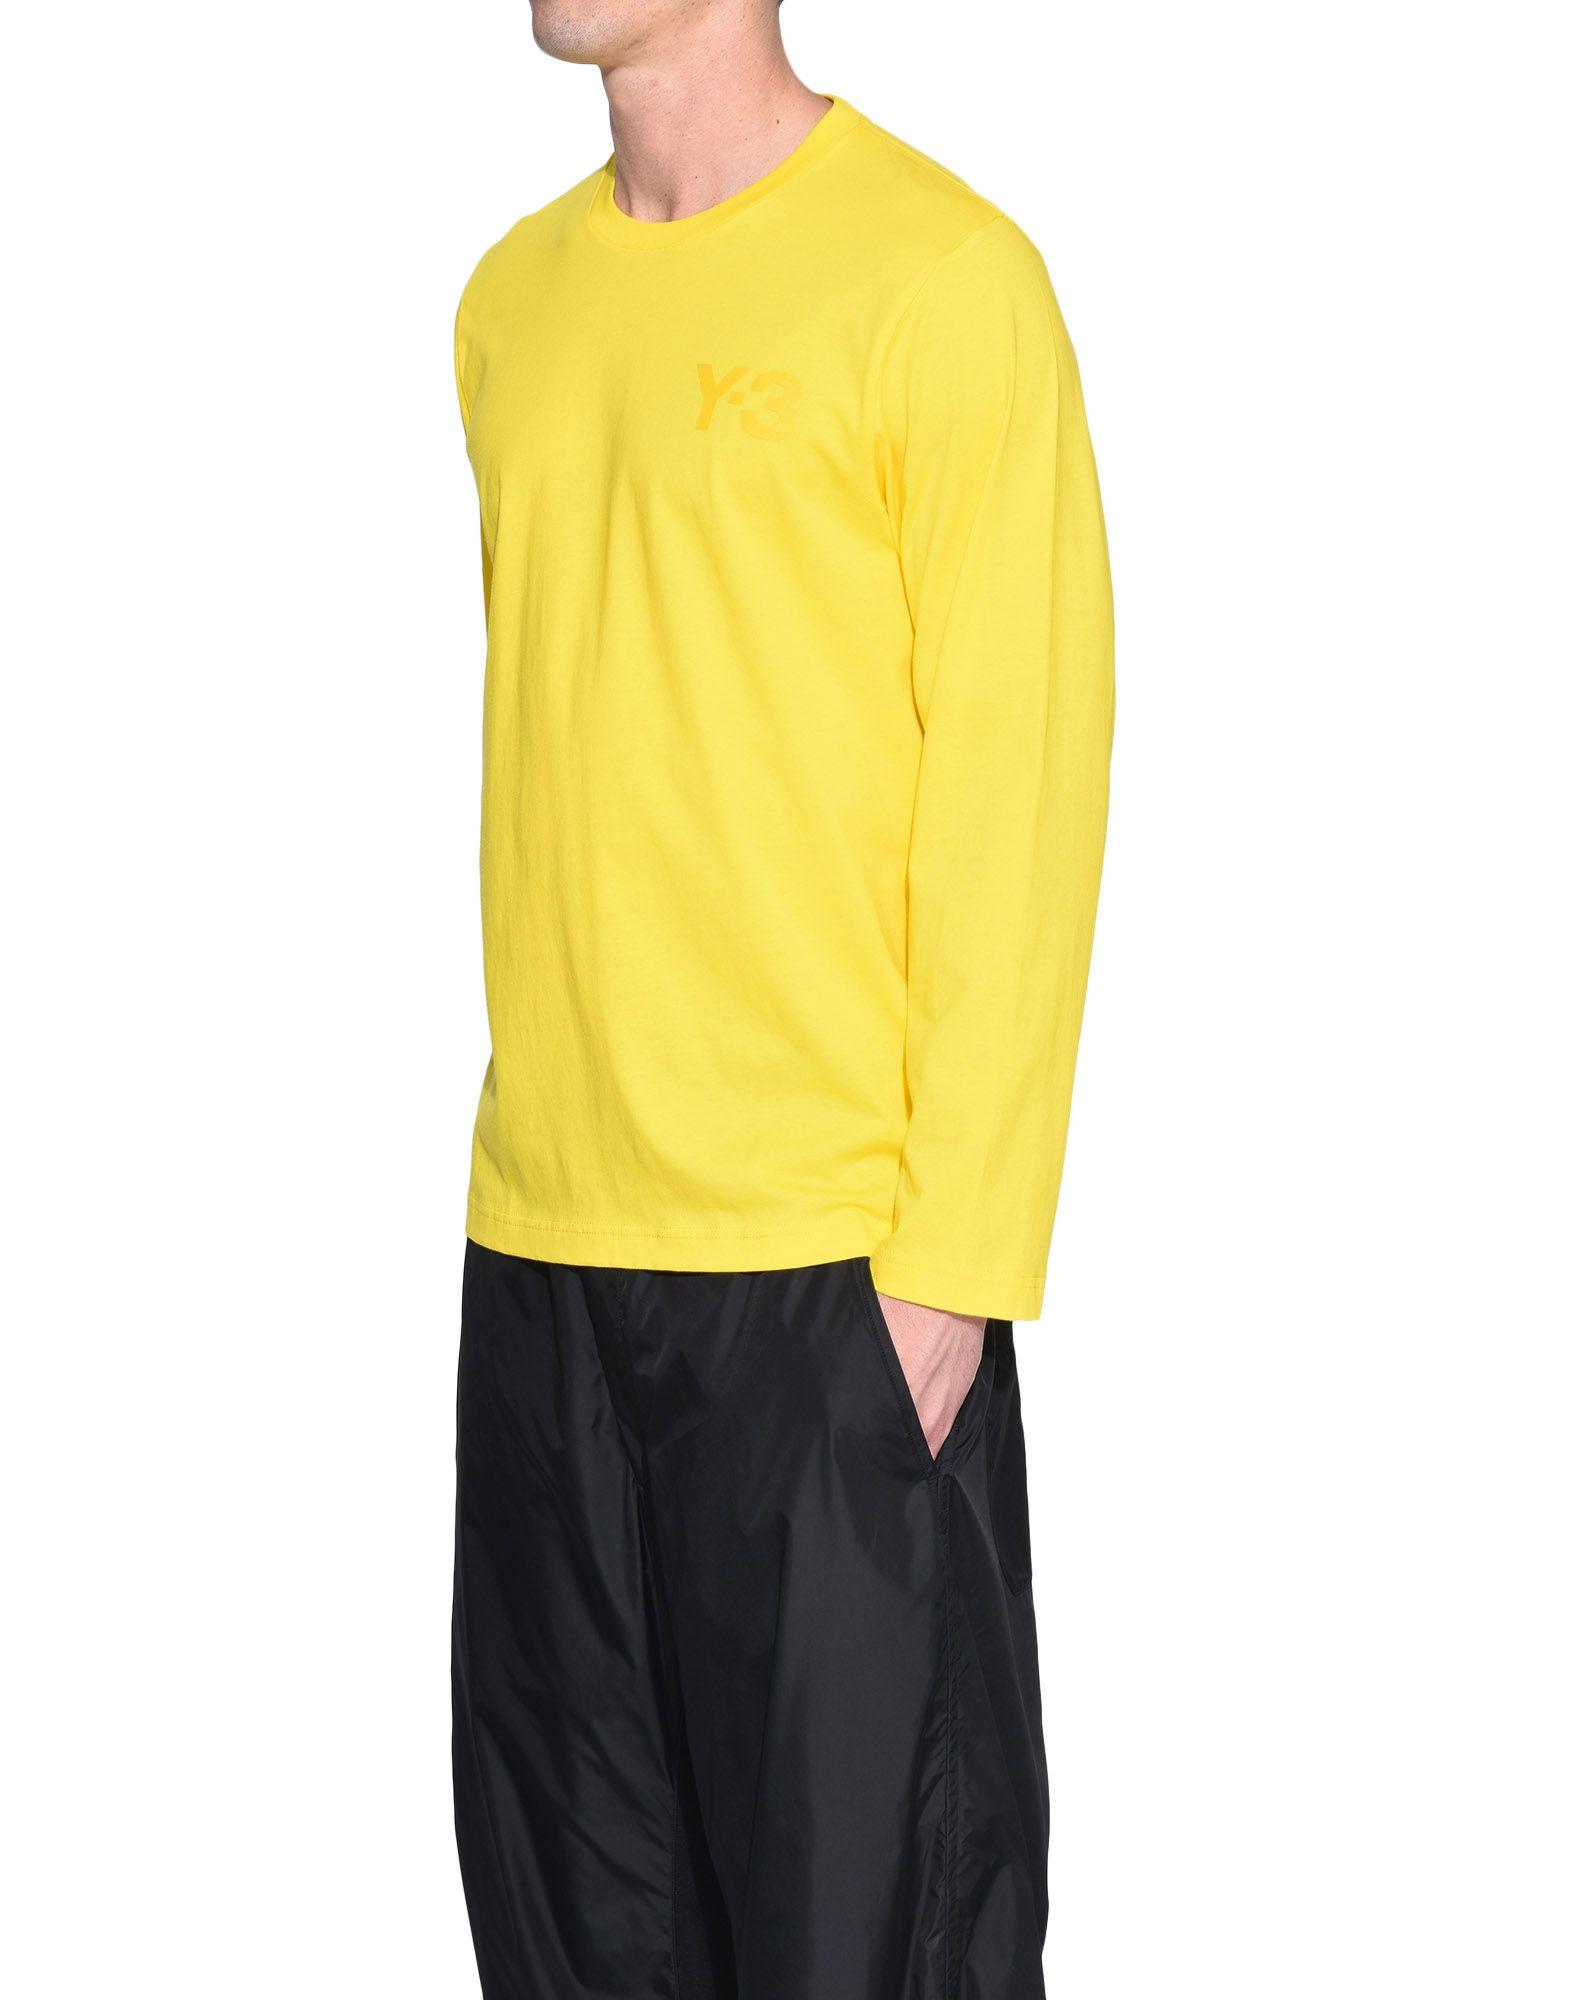 Y-3 Y-3 Classic Tee Long sleeve t-shirt Man e